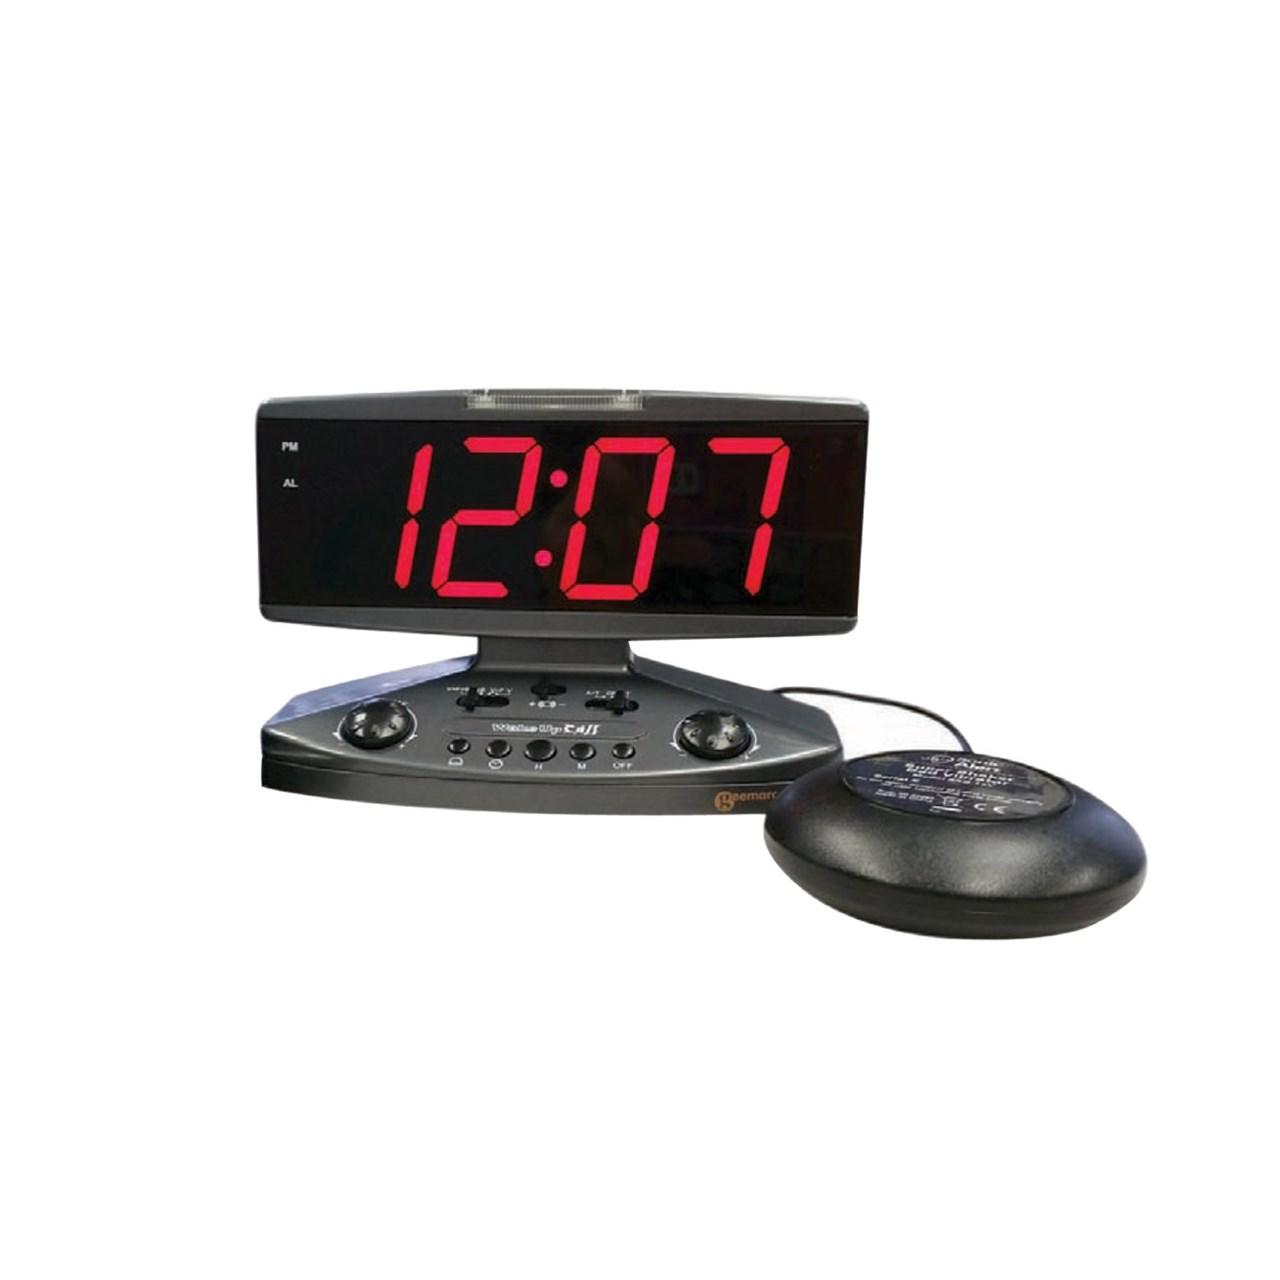 Maxiaids Wake Up Call Alarm Clock With Phone Alert